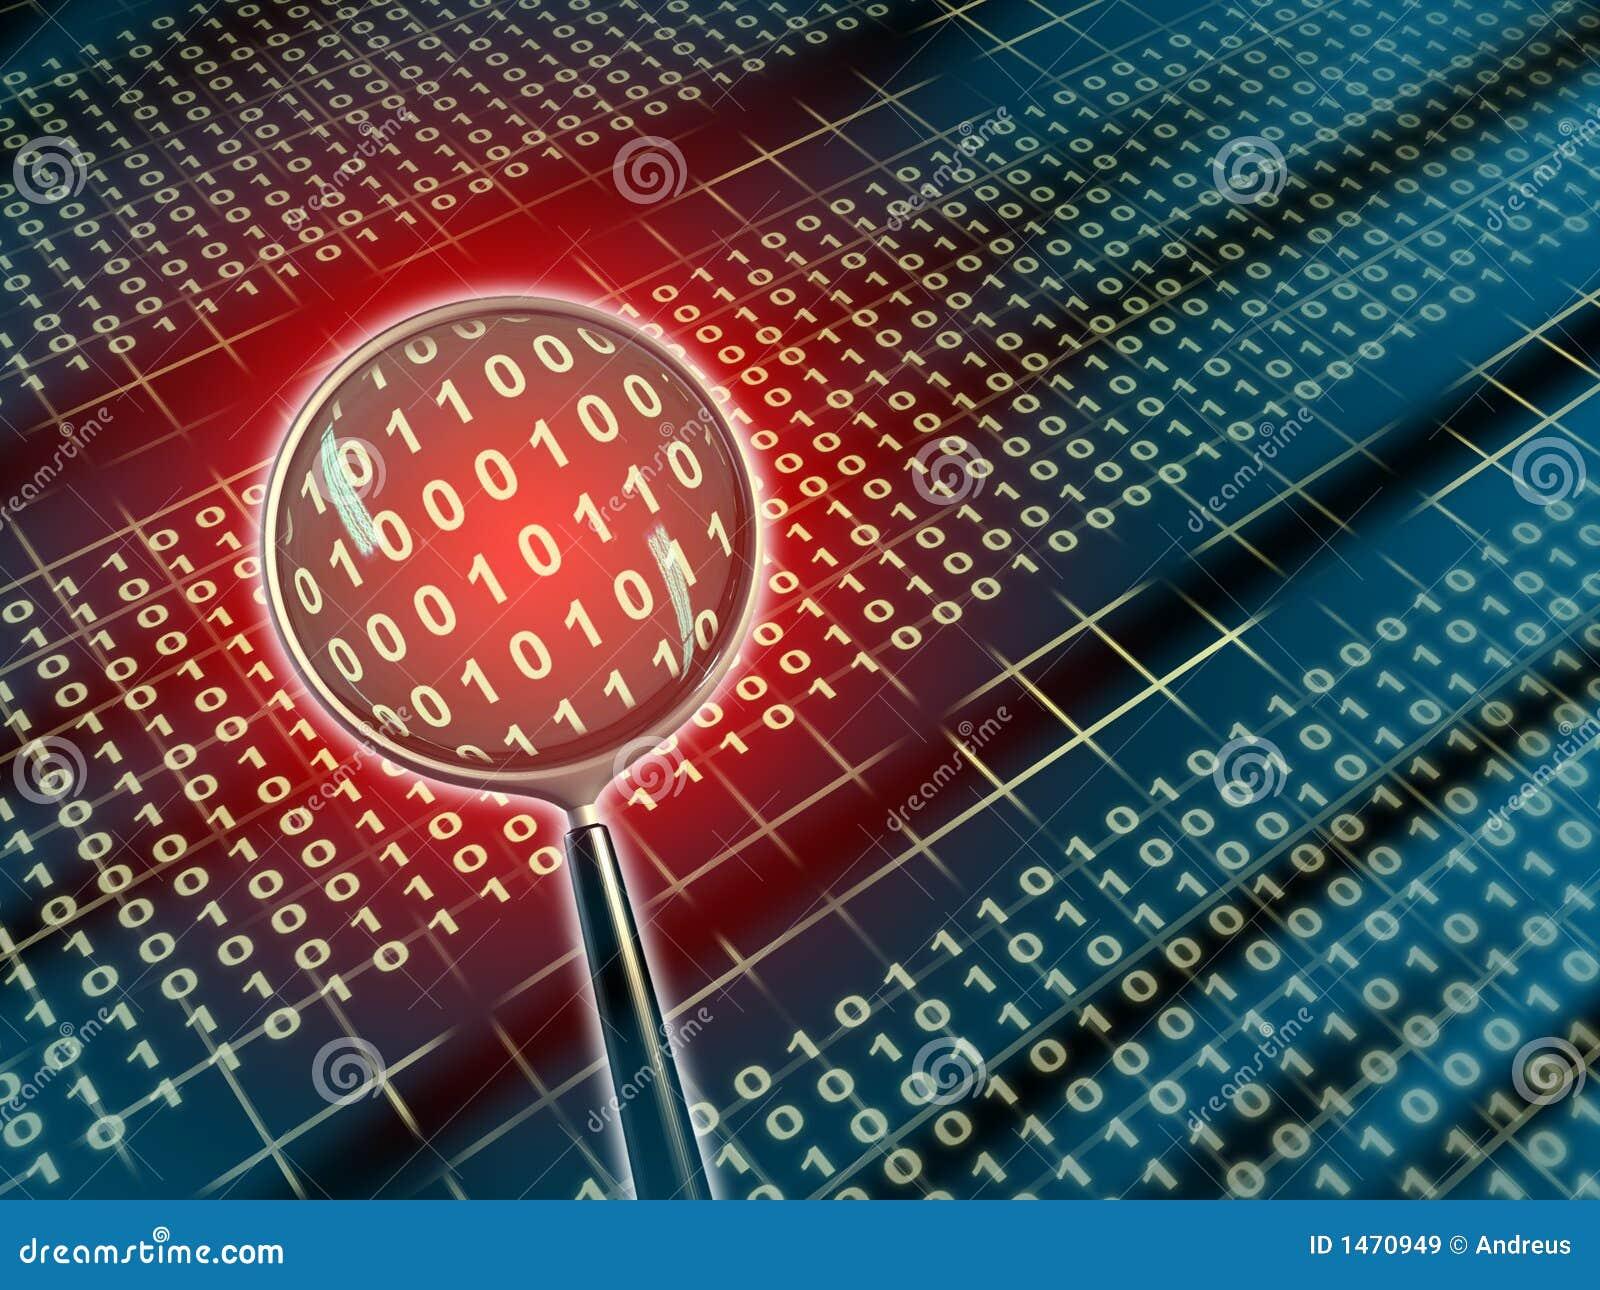 Binary data under a magnifying lens. Digital illustration.